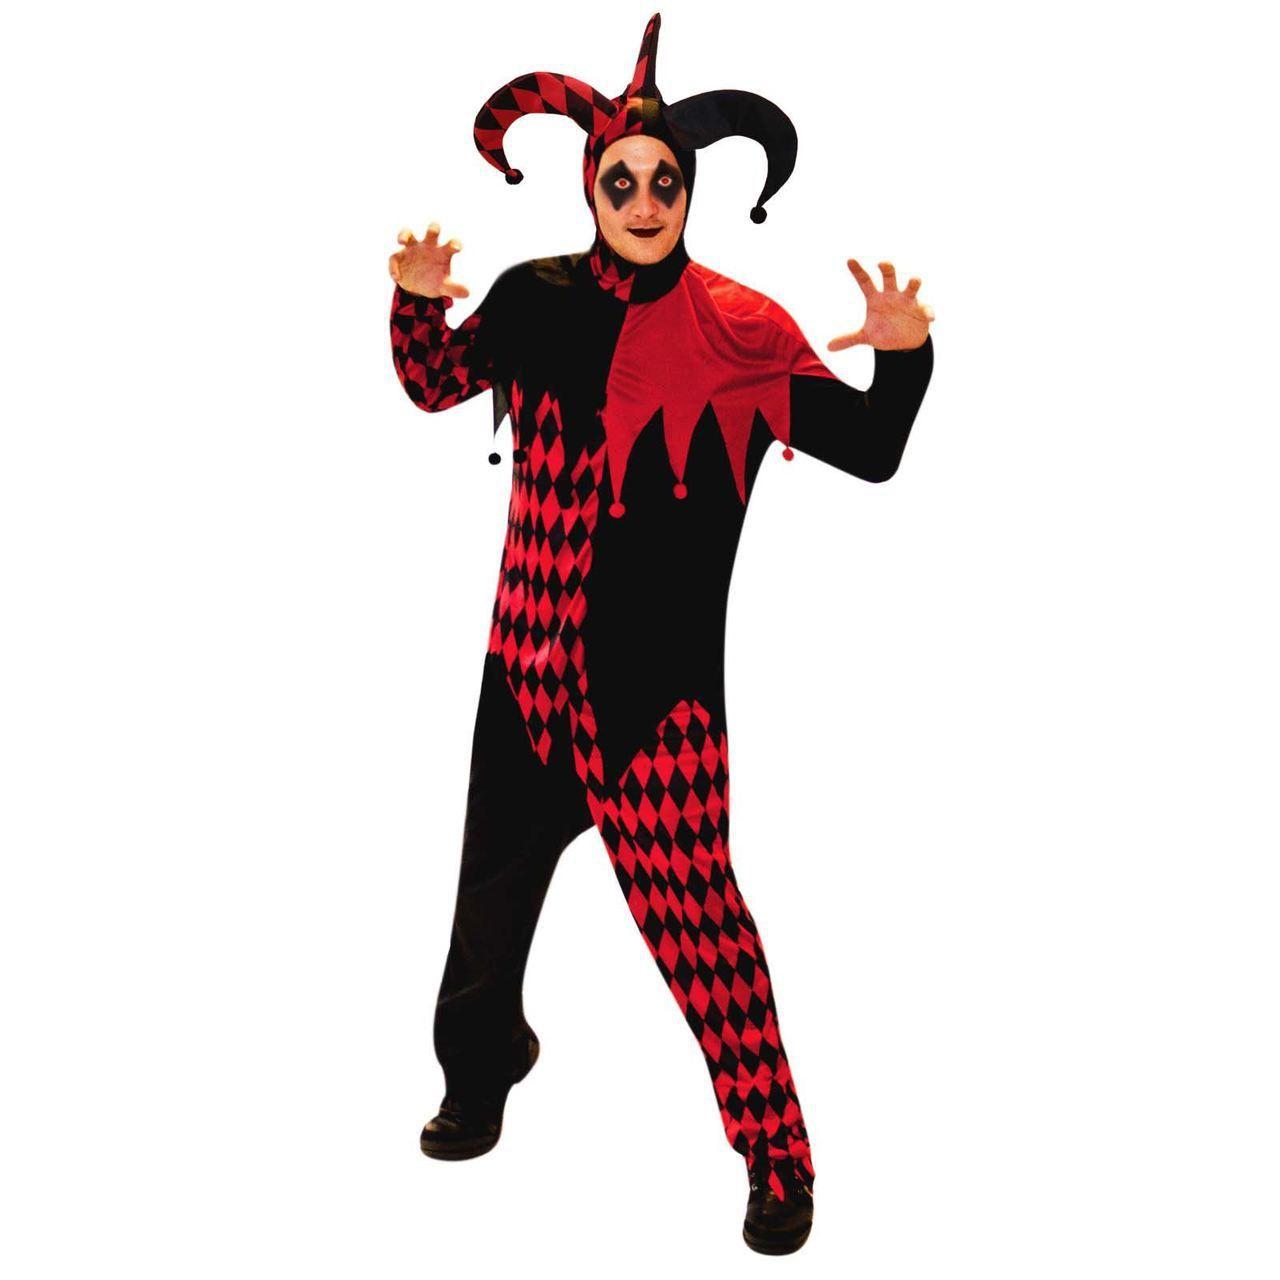 fancydressvip - Deranged Jester Clown Fancy Dress Costume, £17.99 ...